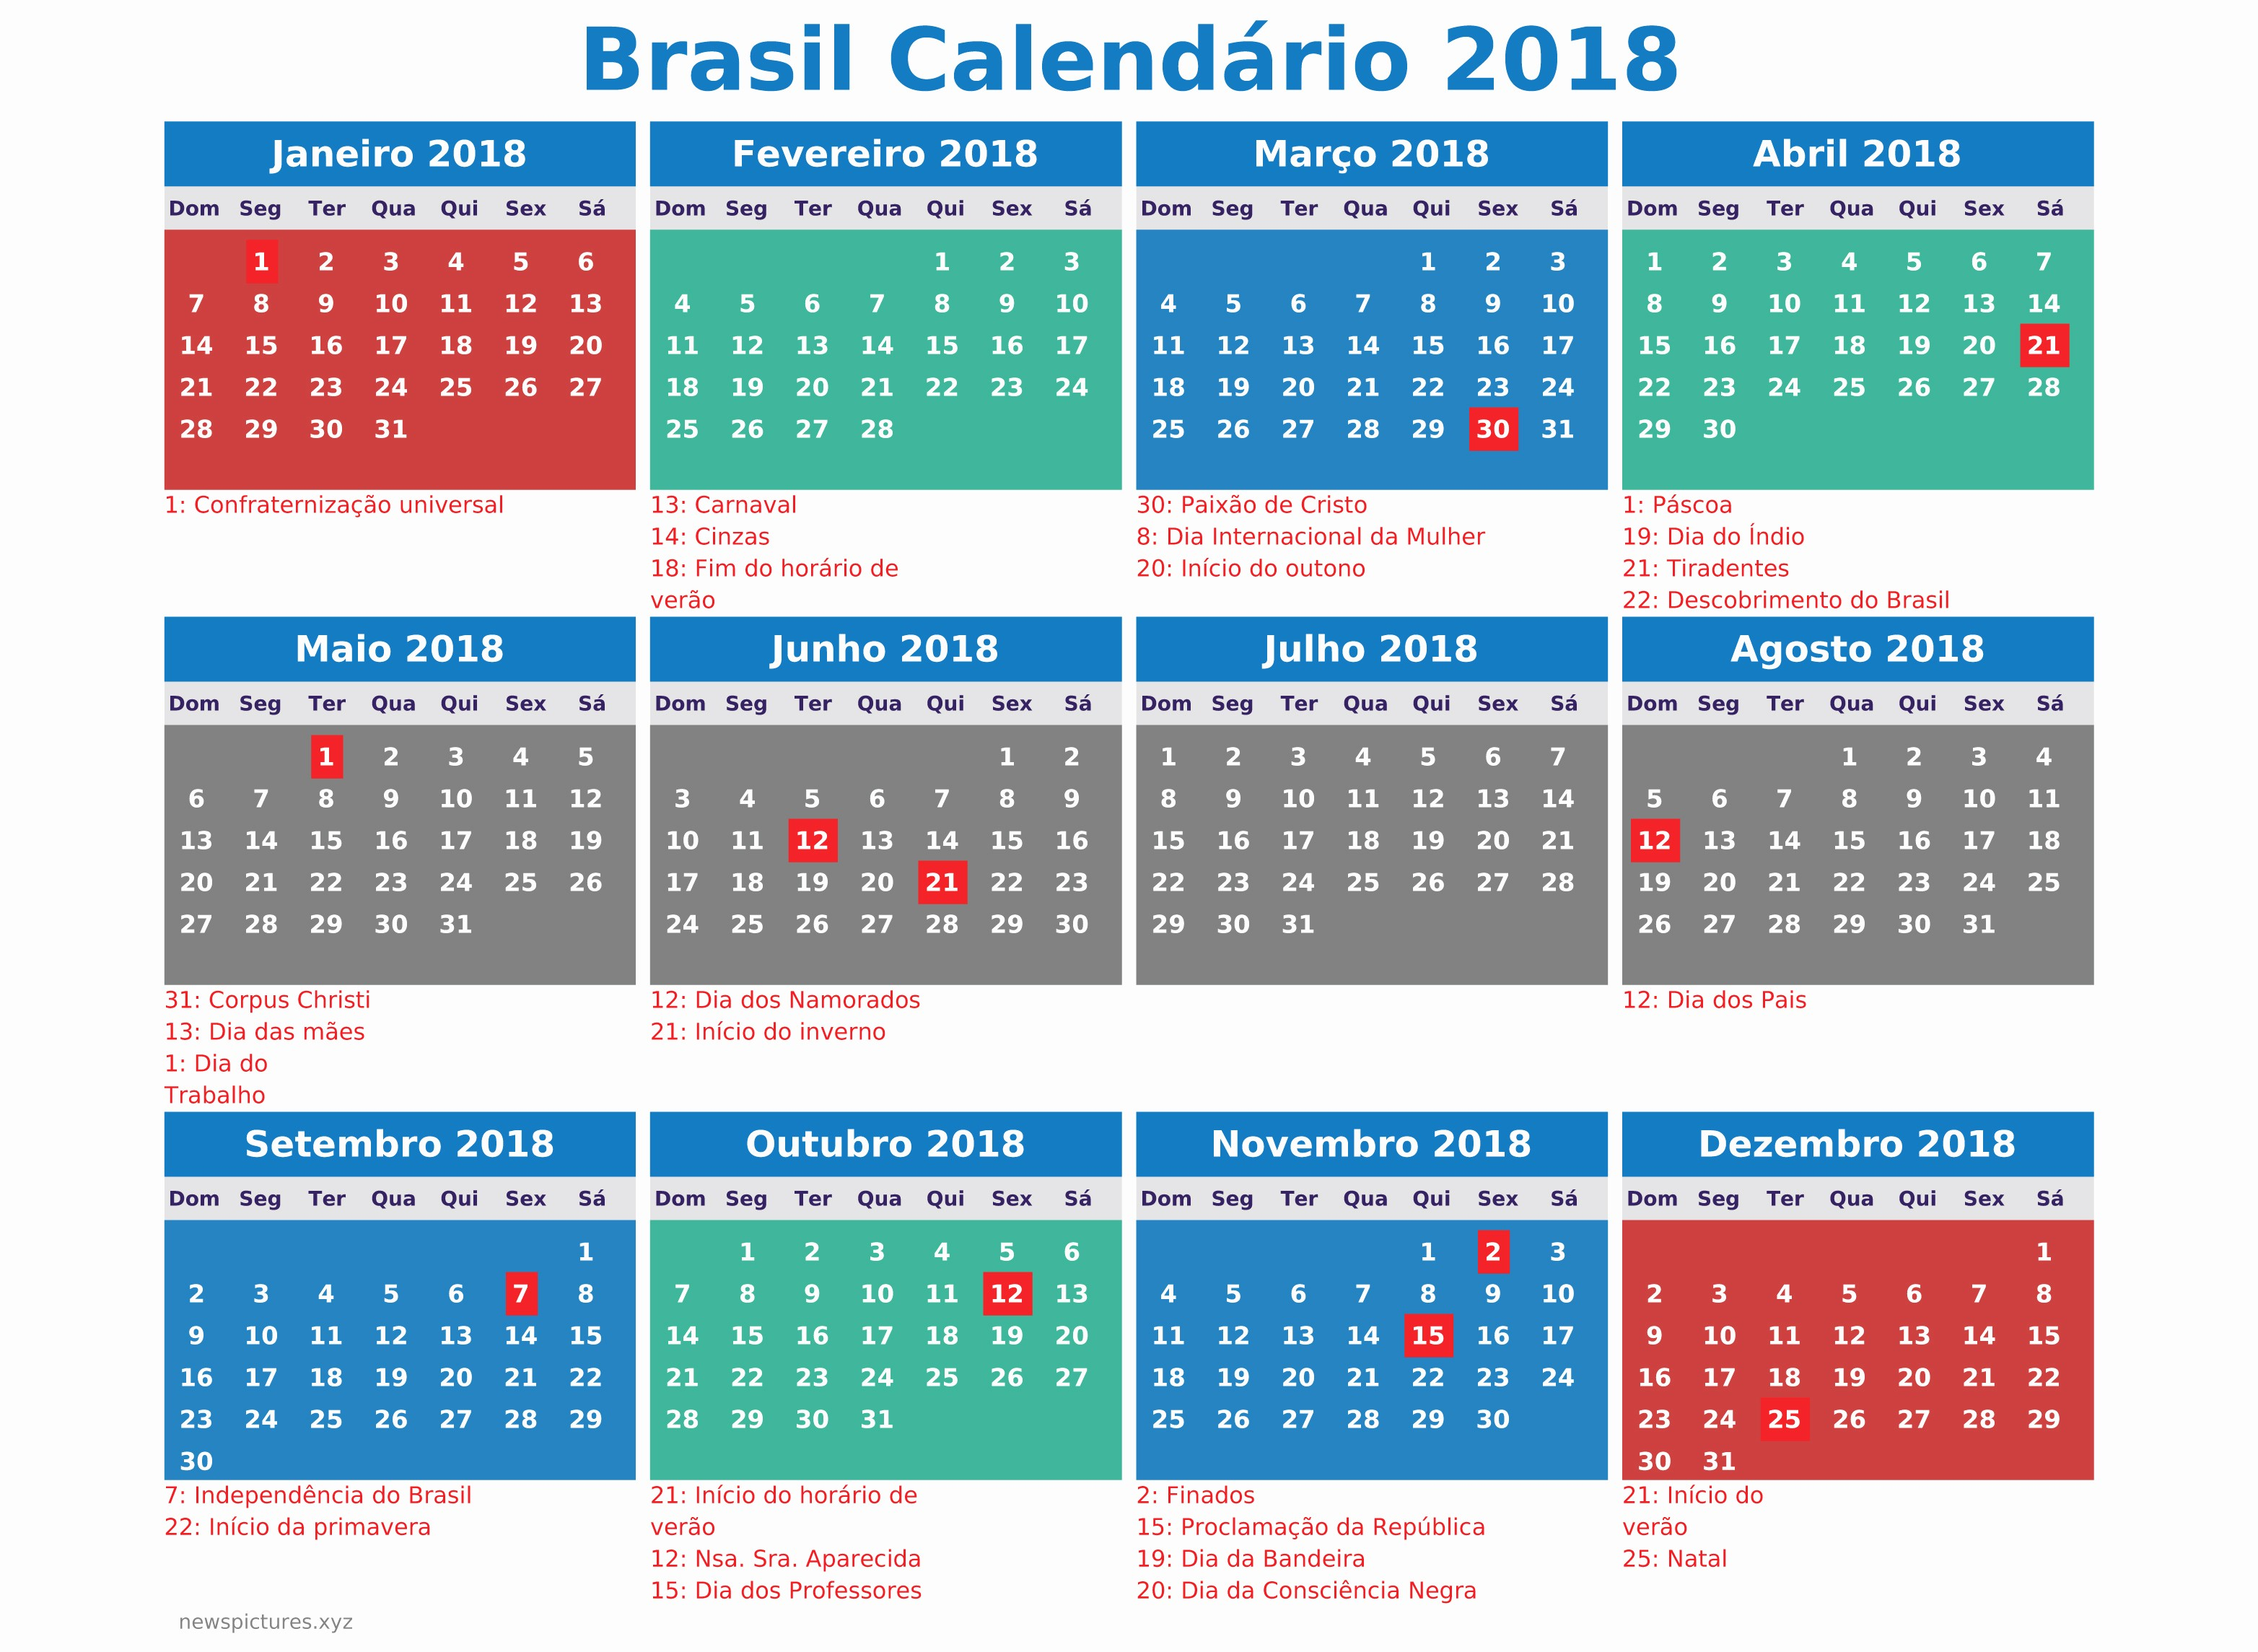 Calendario De Amor Letra 2019 Calendario 2018 Pdf Para Imprimir Download Gratis toda